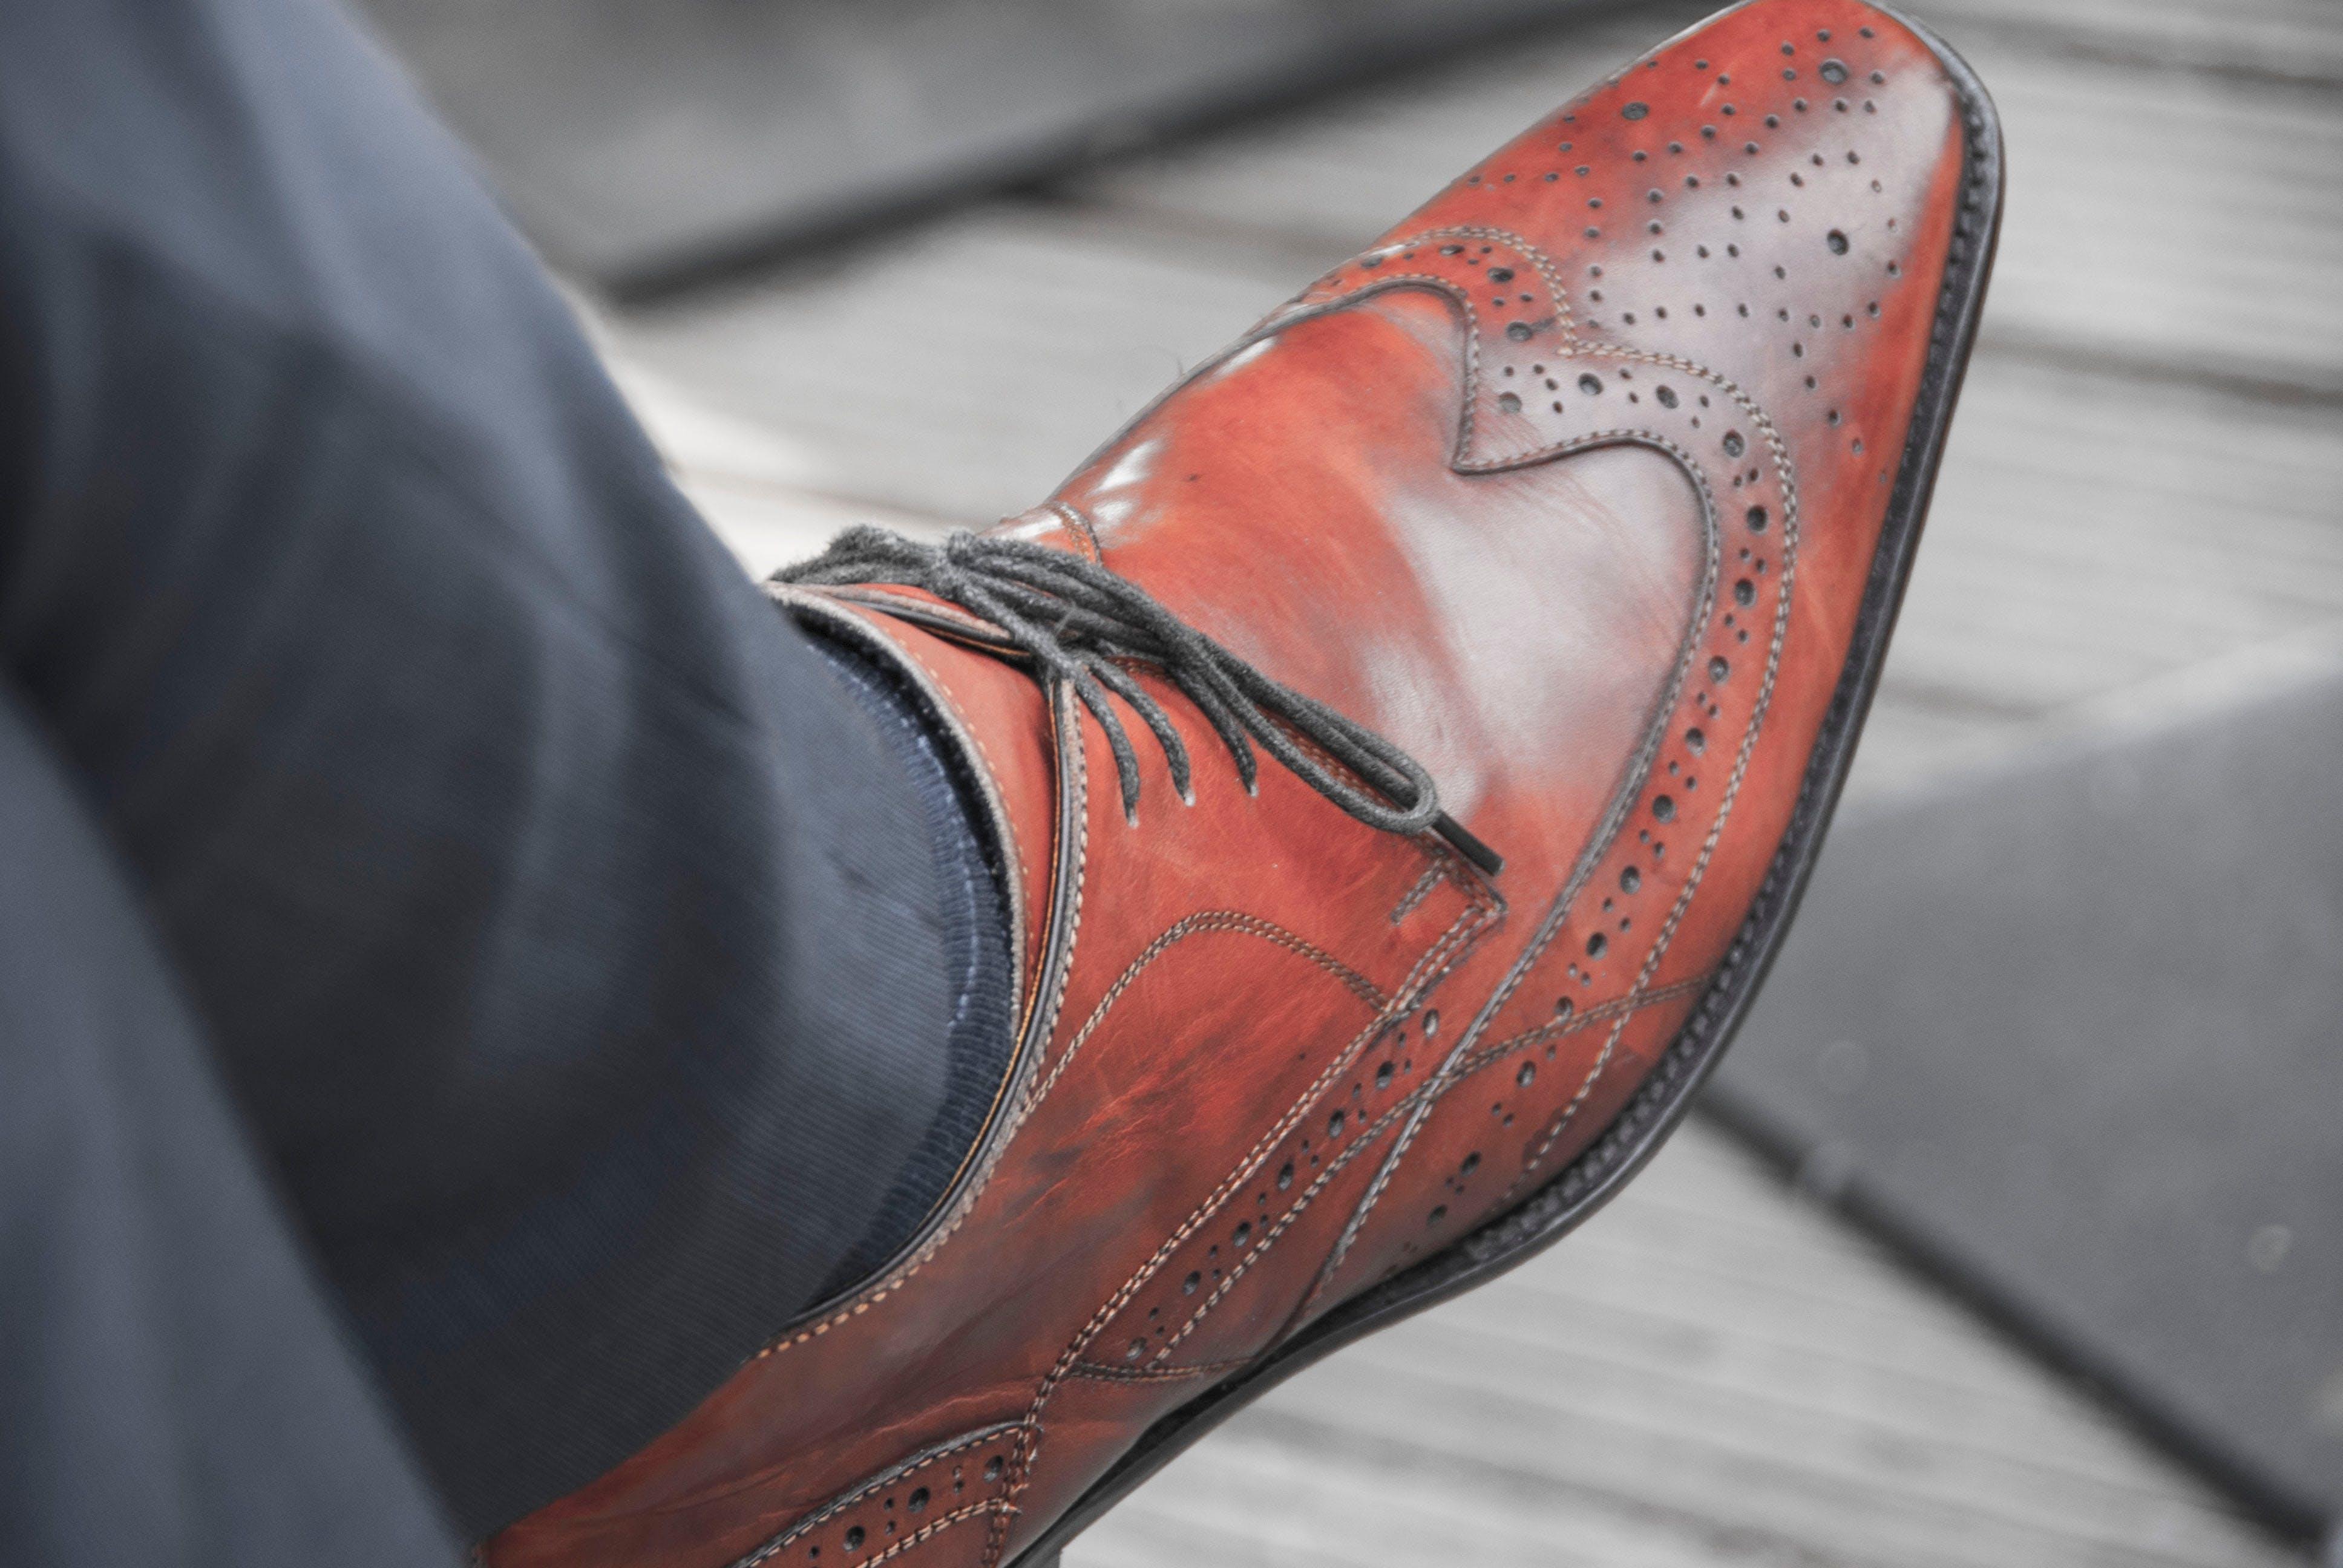 Free stock photo of pants, shoe, detaild